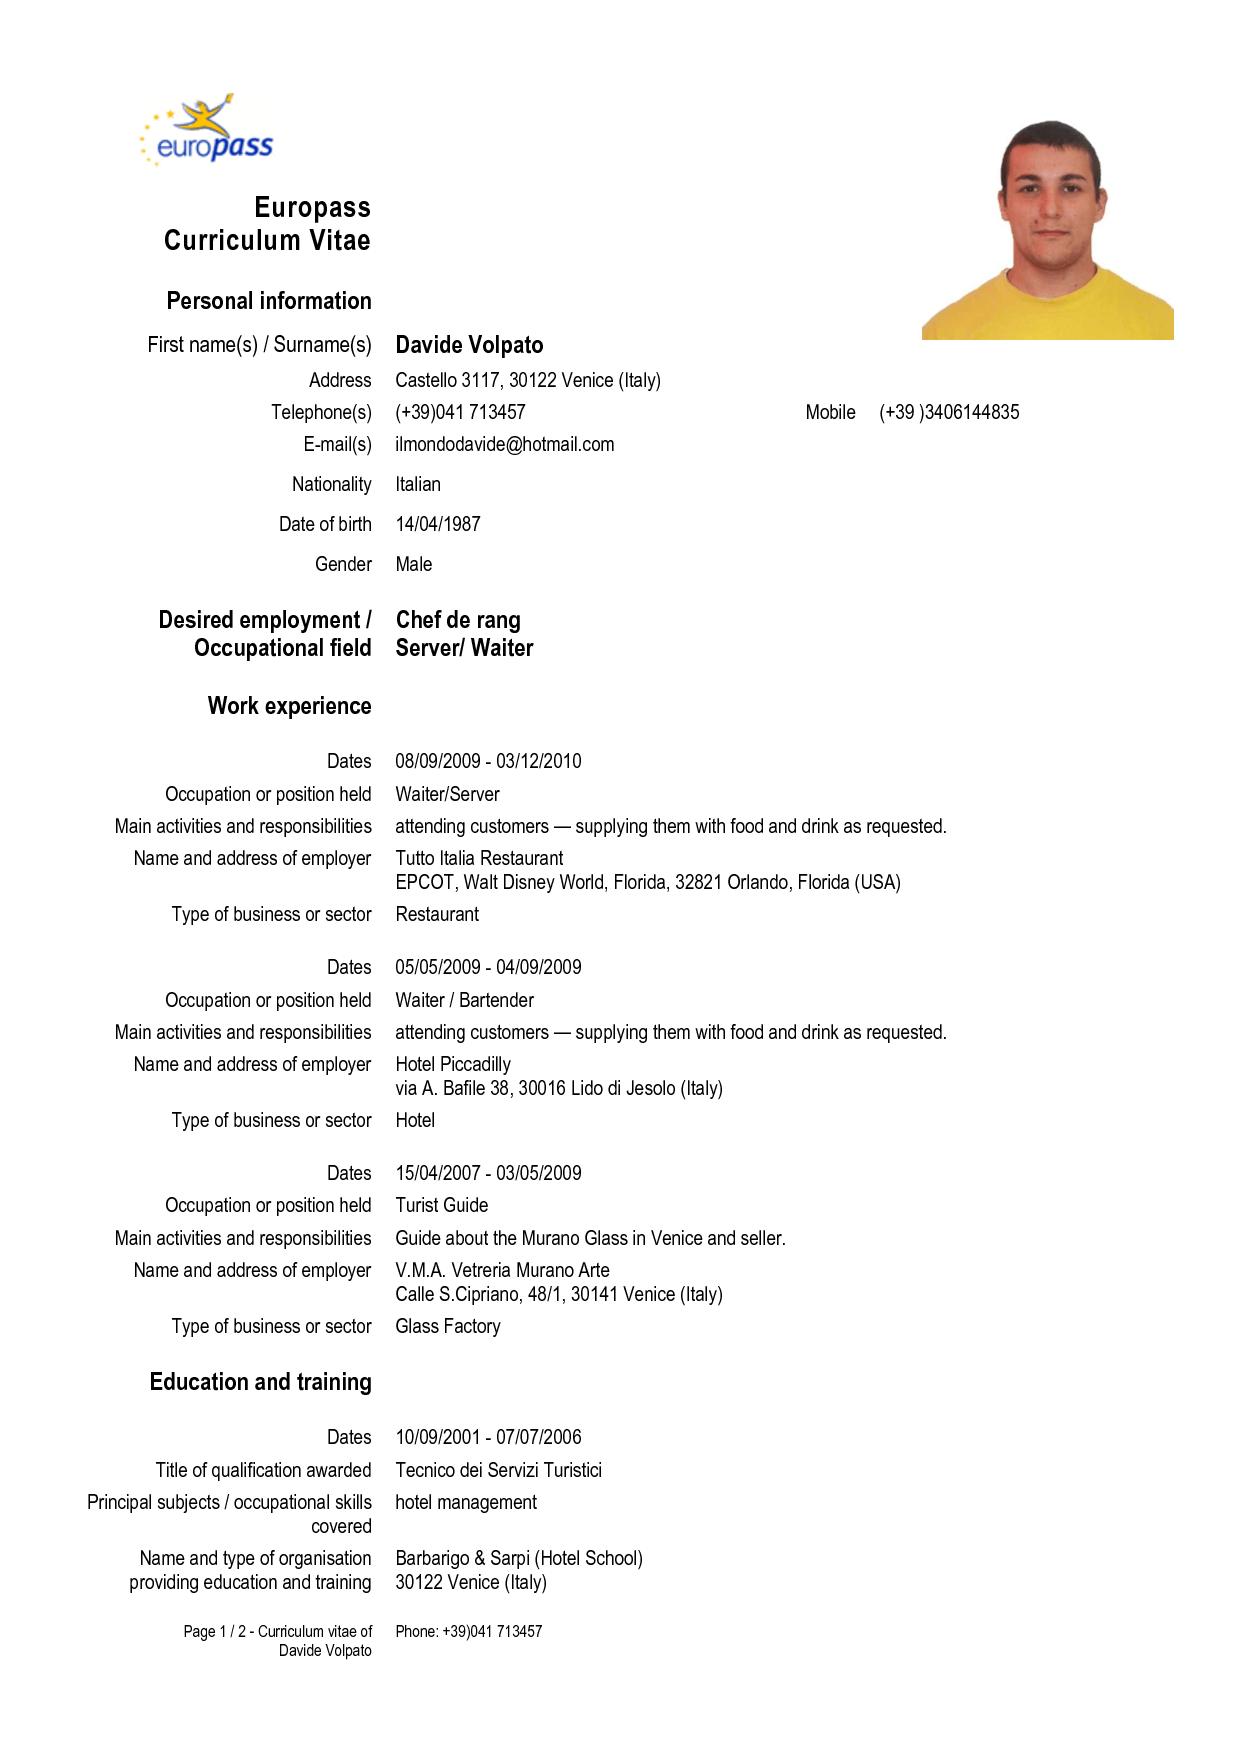 europass cv english form